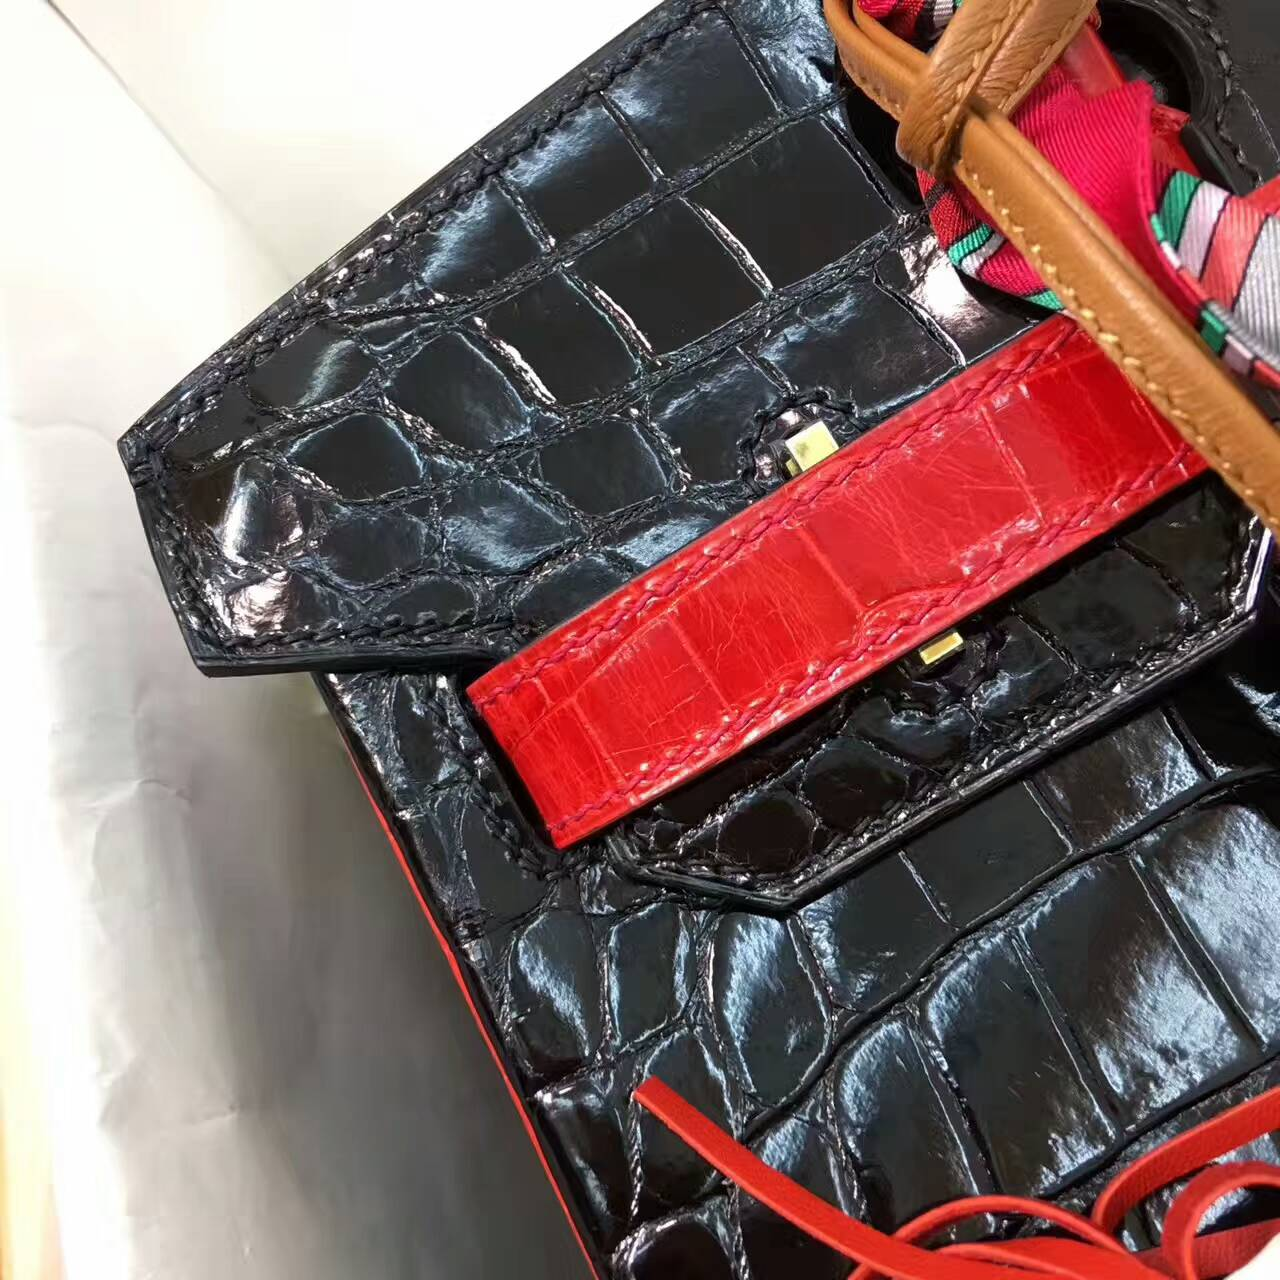 Birkin铂金包 Hermes包包 30cm Shiny Niloticus Crocodile 亮面两点非洲原产尼罗鳄 89 Nior 黑色拼95 Braise 法拉利红 金扣